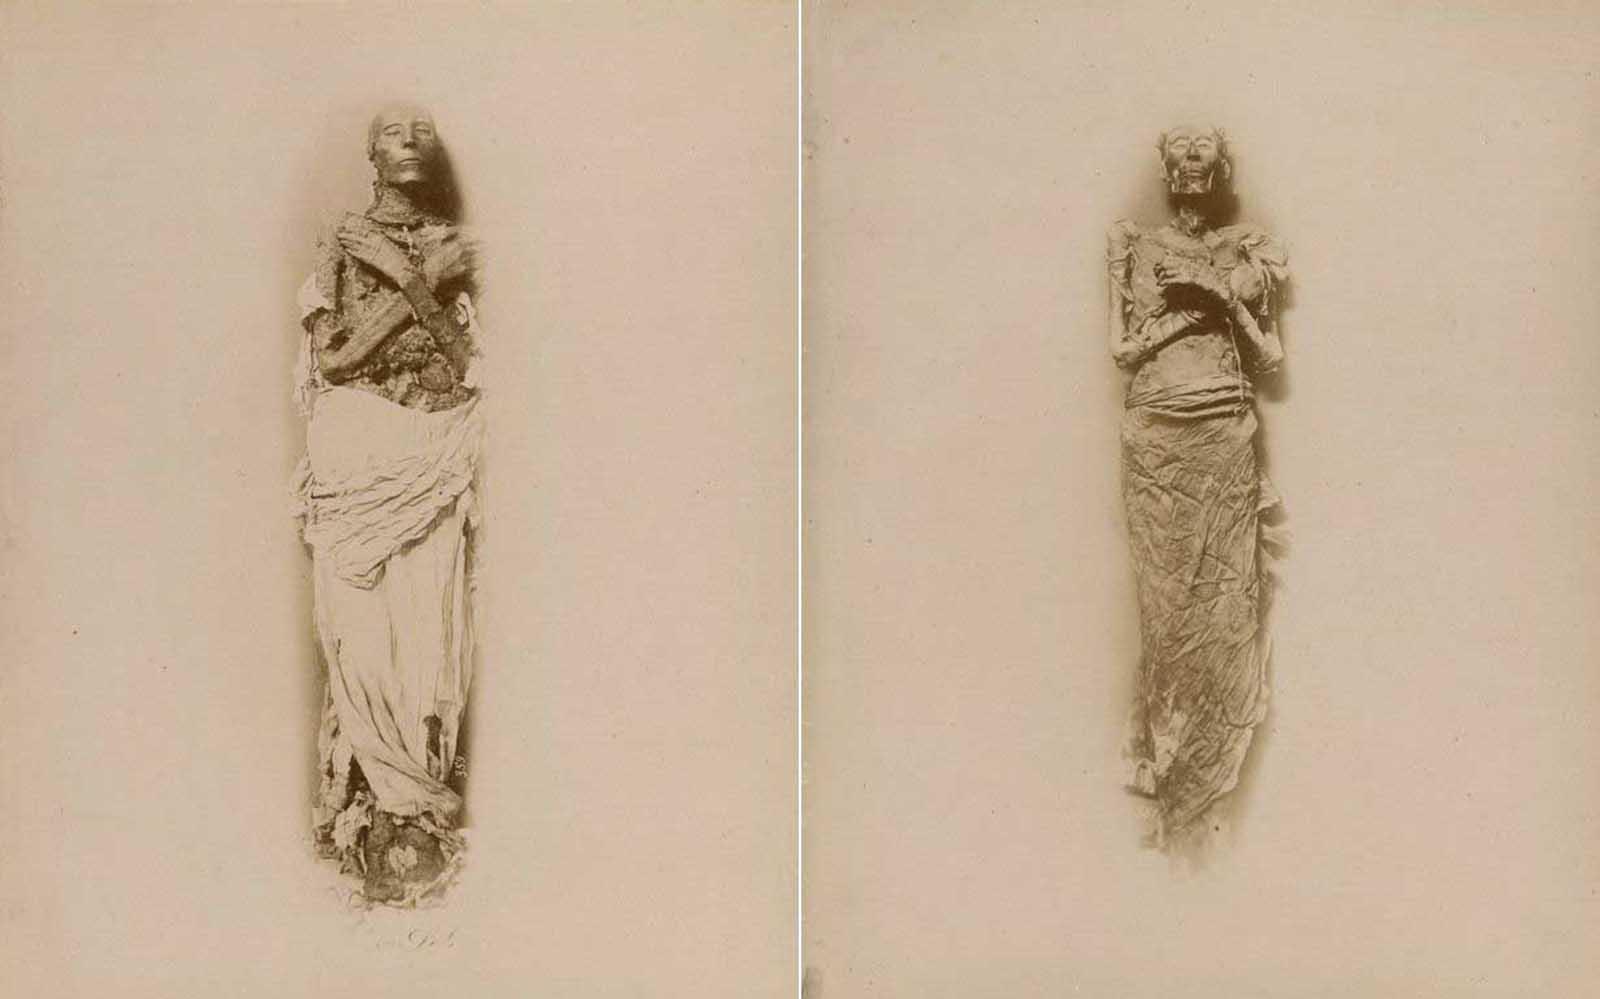 (Izquierda) La momia de Seti I, que reinó alrededor de 1290-1279 aC. (Derecha) La momia de Ramsés II, quien reinó entre 1279-1213 a.